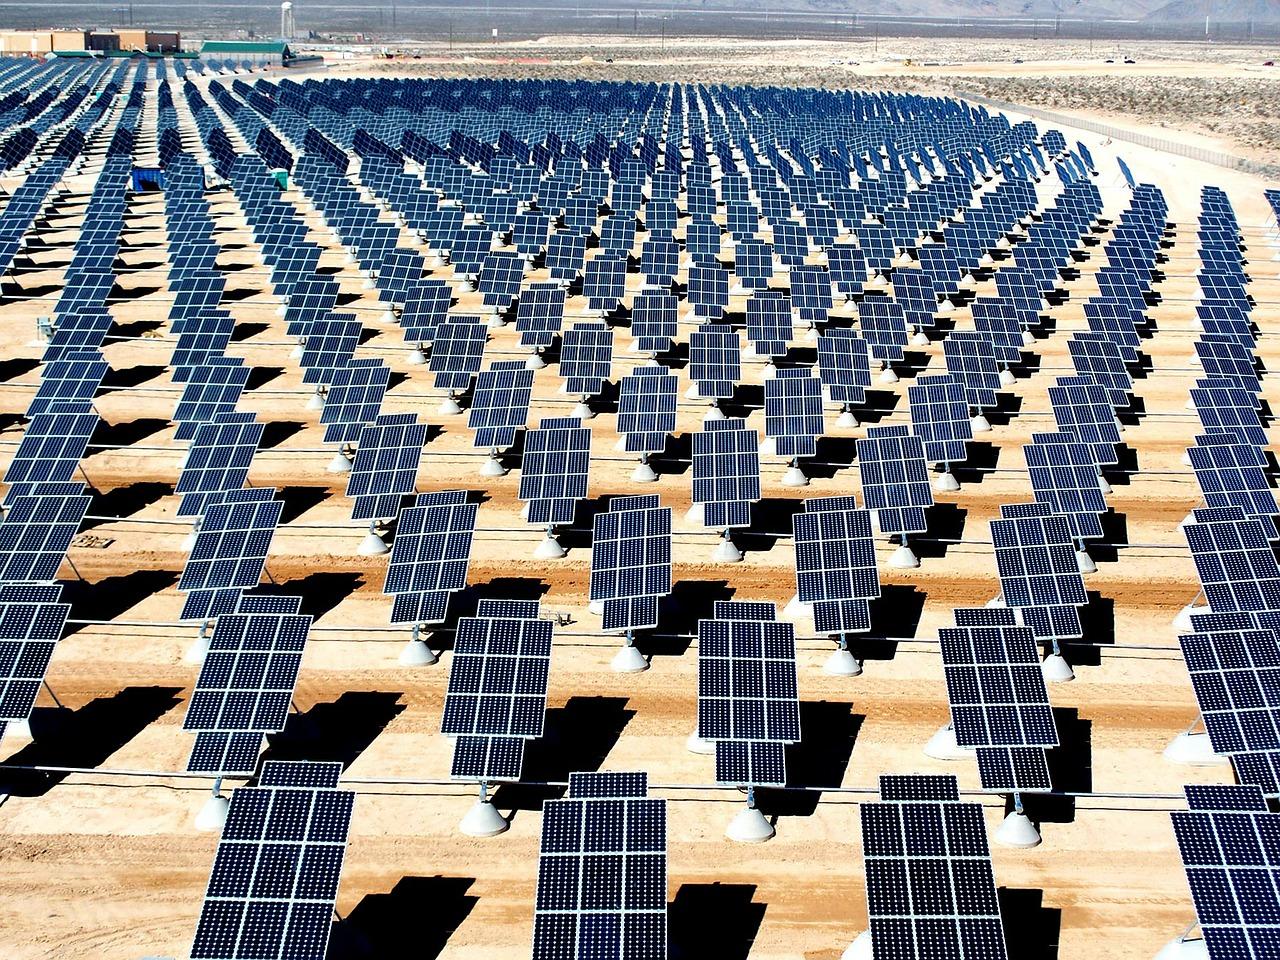 AleaSoft - Photovoltaic power plant solar panels array